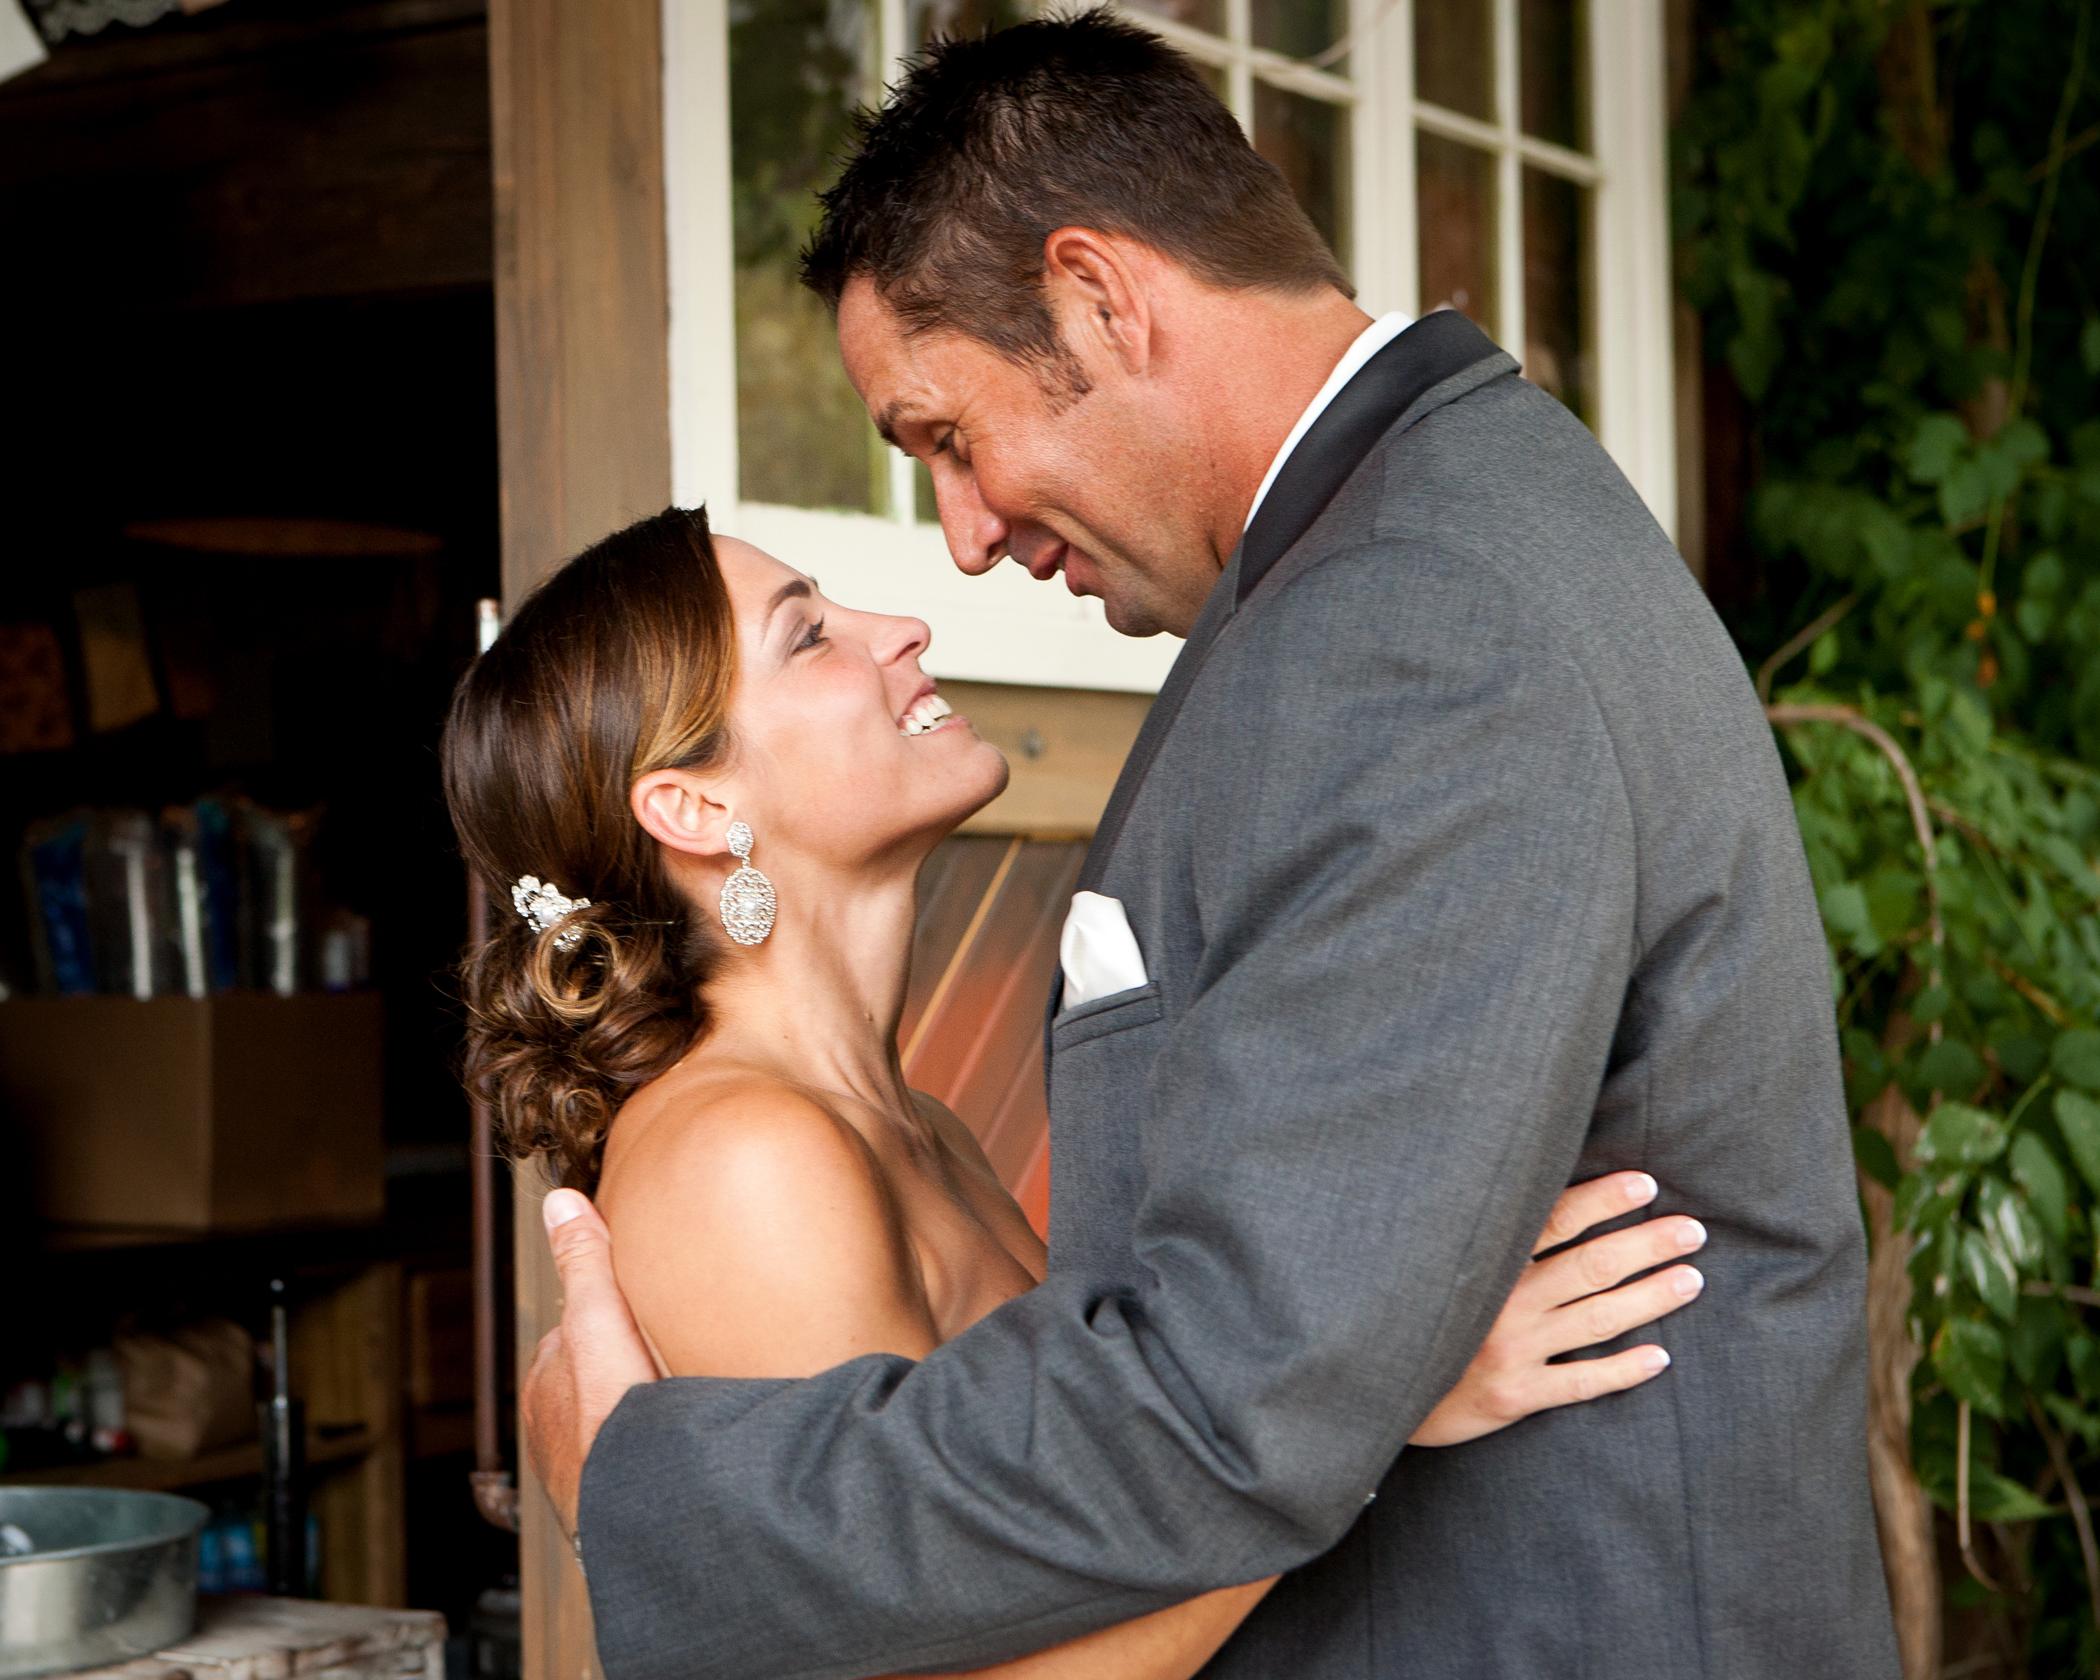 Wedding-Photography-Mill-Creek-Barn-Southwest-Michigan_95.jpg